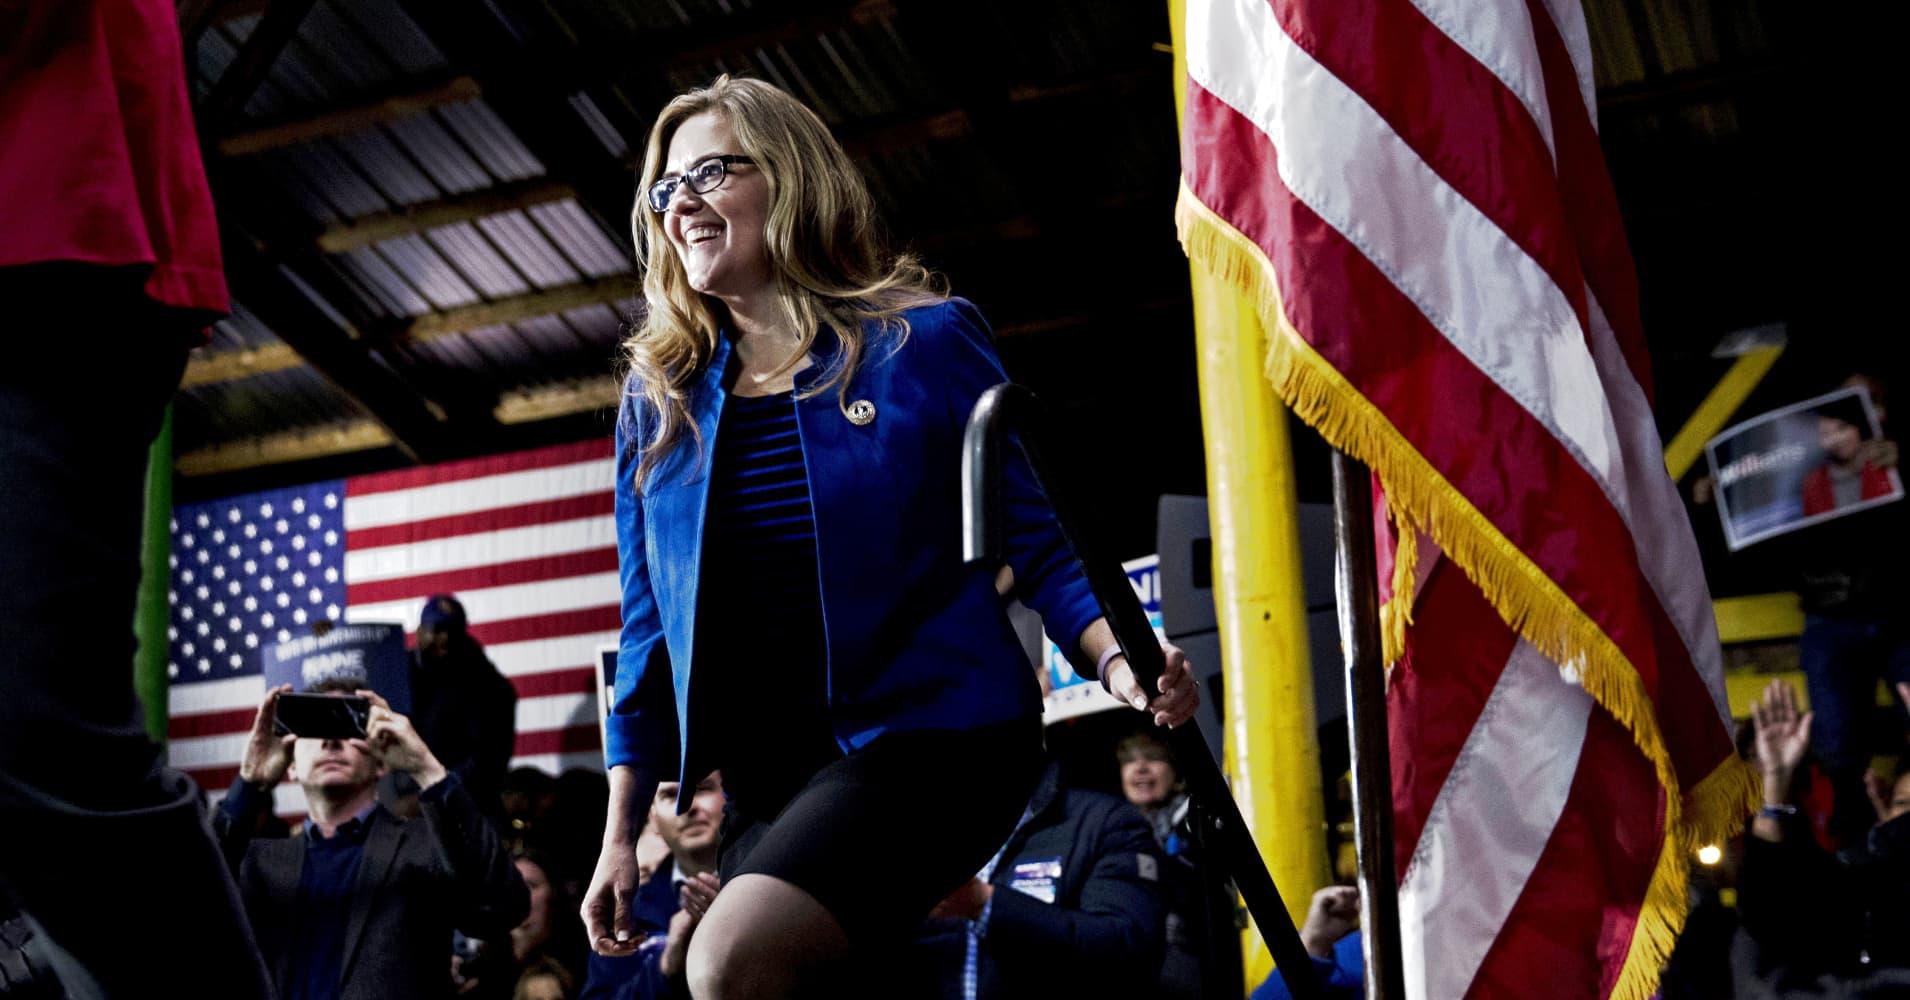 Democrat Jennifer Wexton unseats GOP Rep. Barbara Comstock in Virginia: NBC News